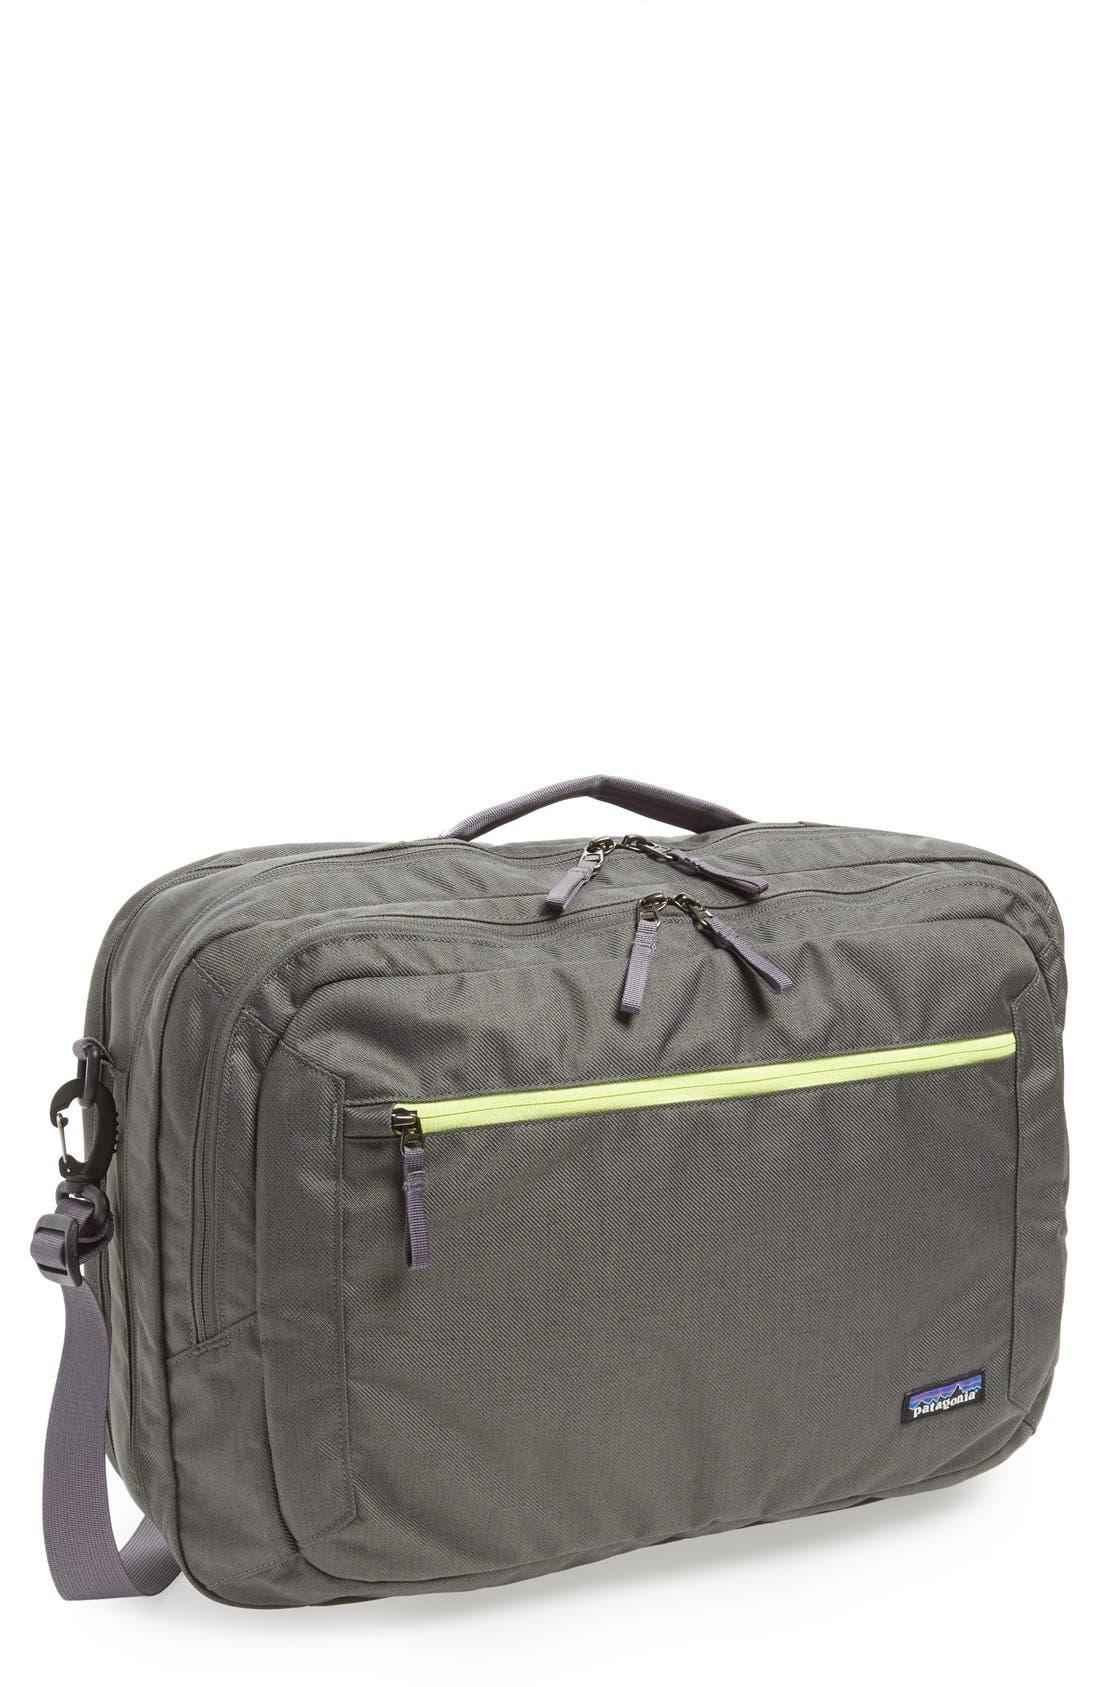 Alternate Image 1 Selected - Patagonia 'Transport' Messenger Bag